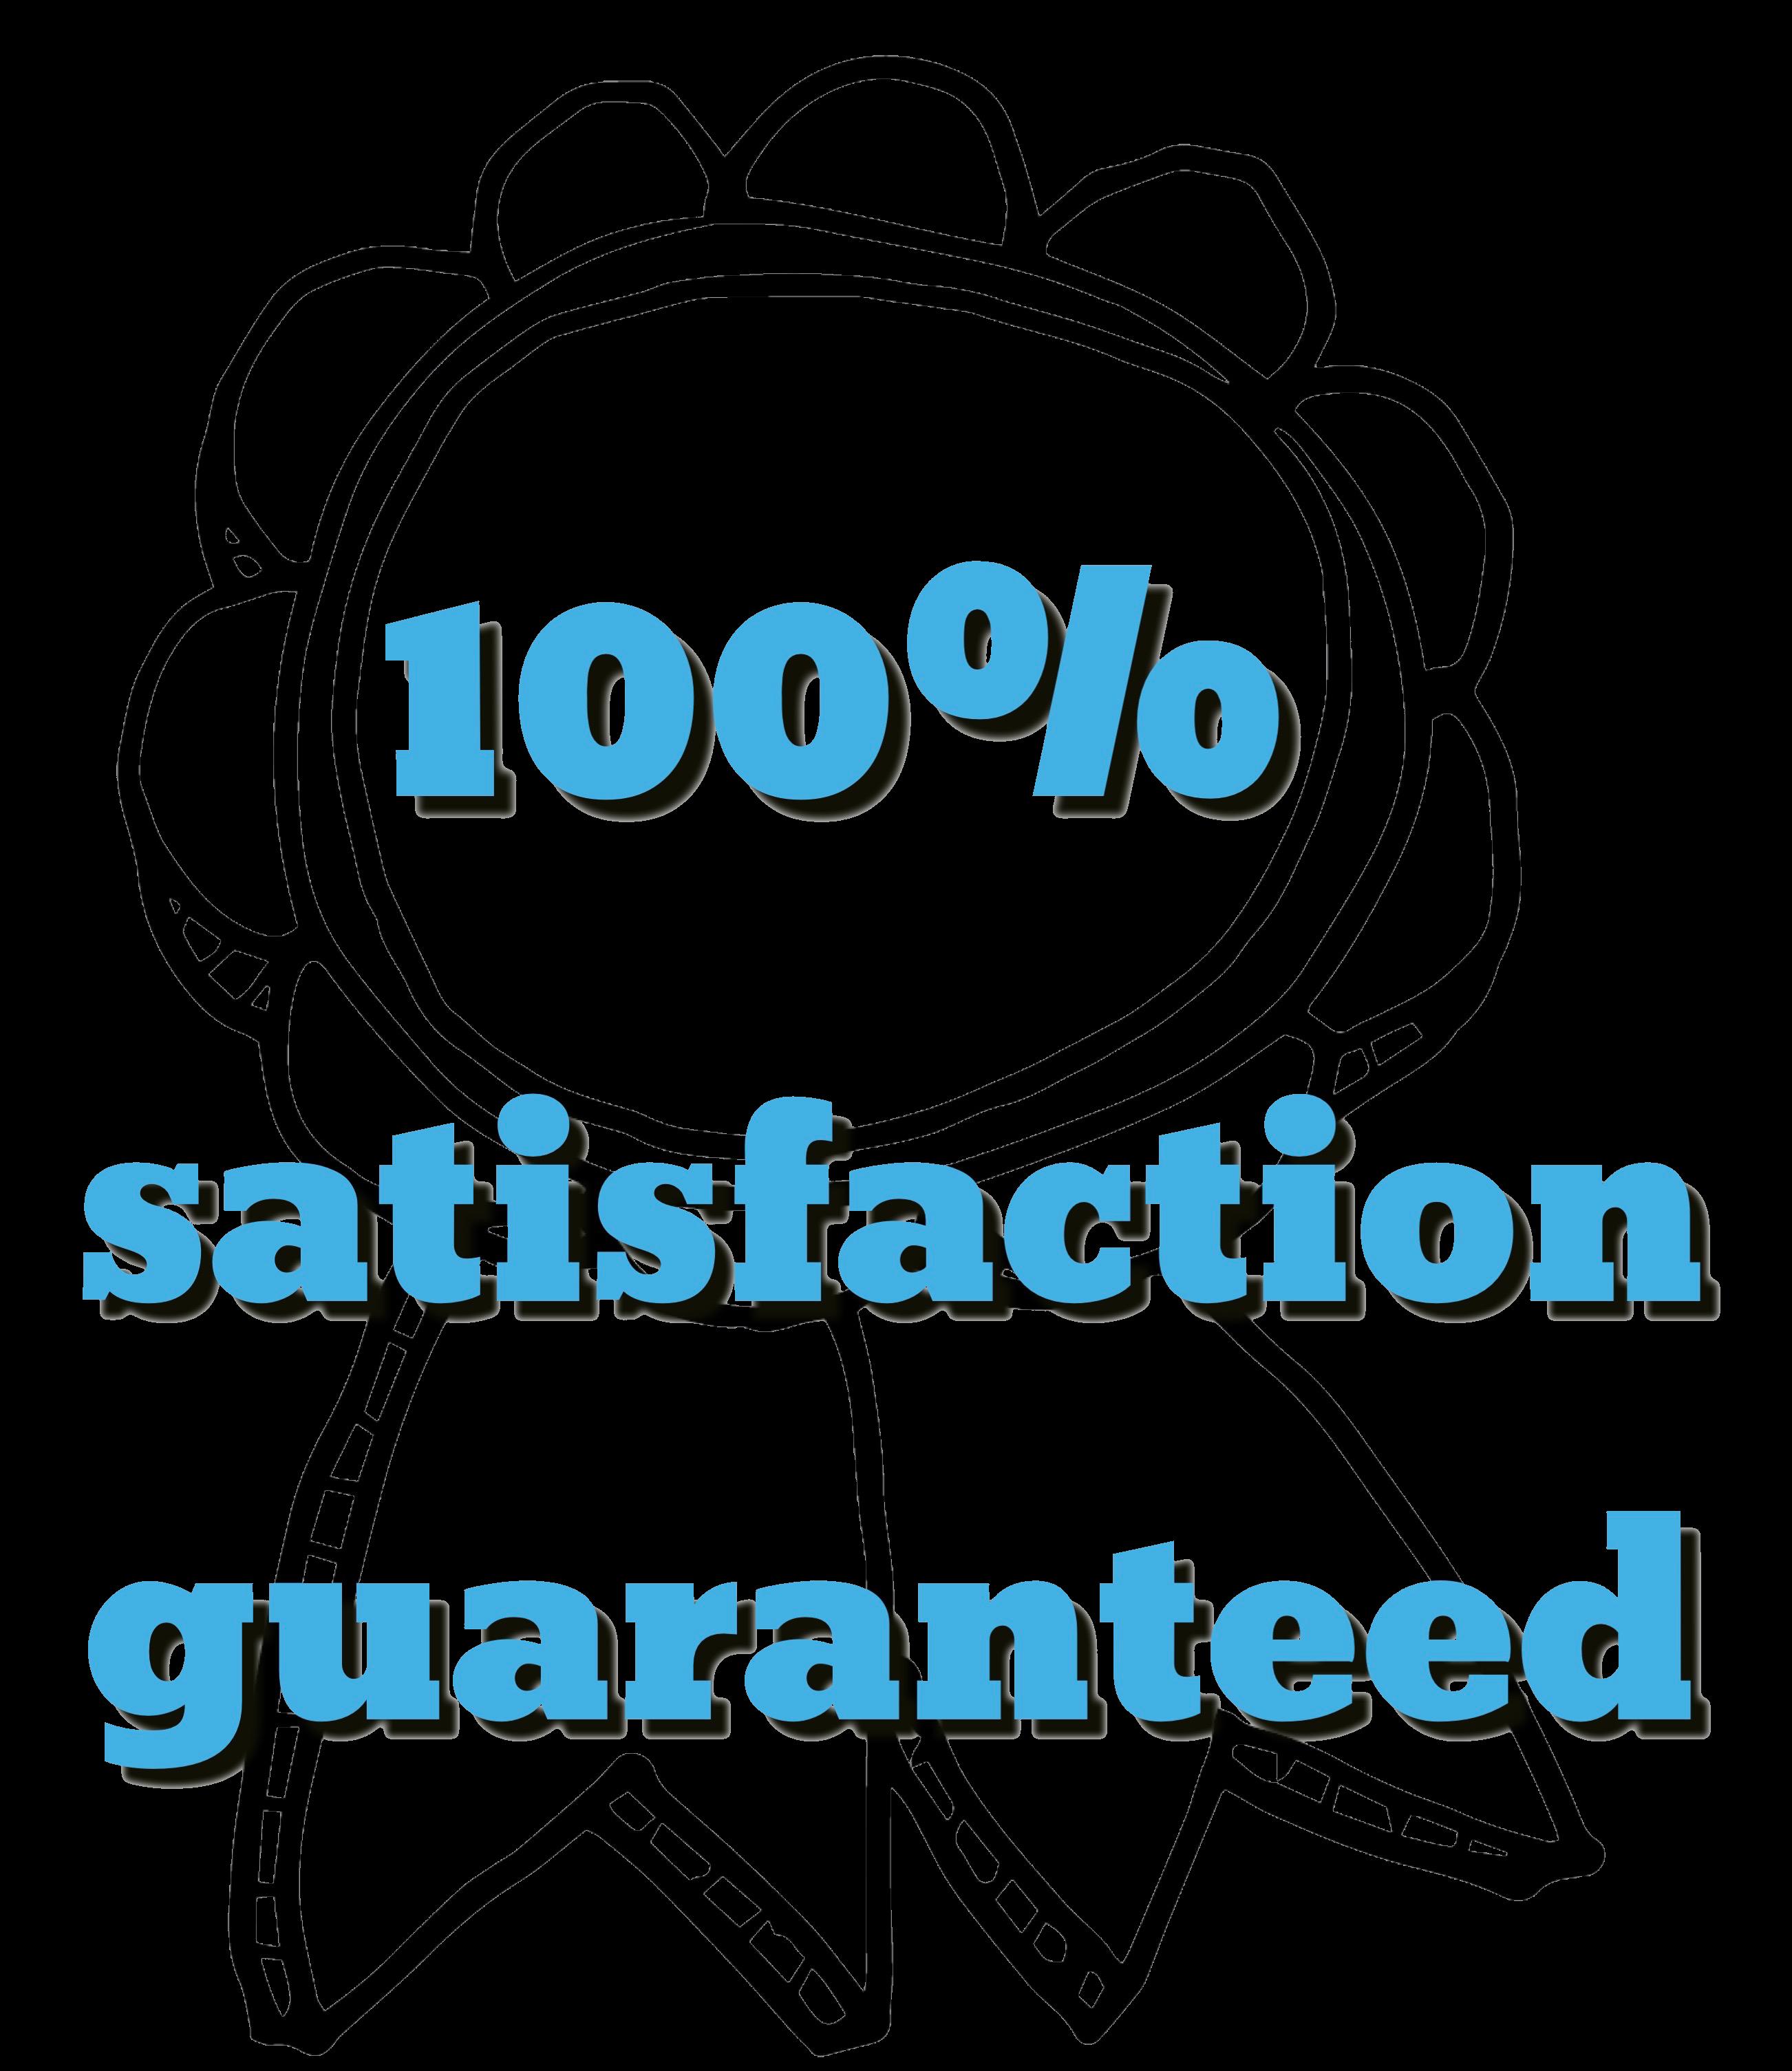 Alpha Roofing proud itself in 100% satisfaction guaranteed